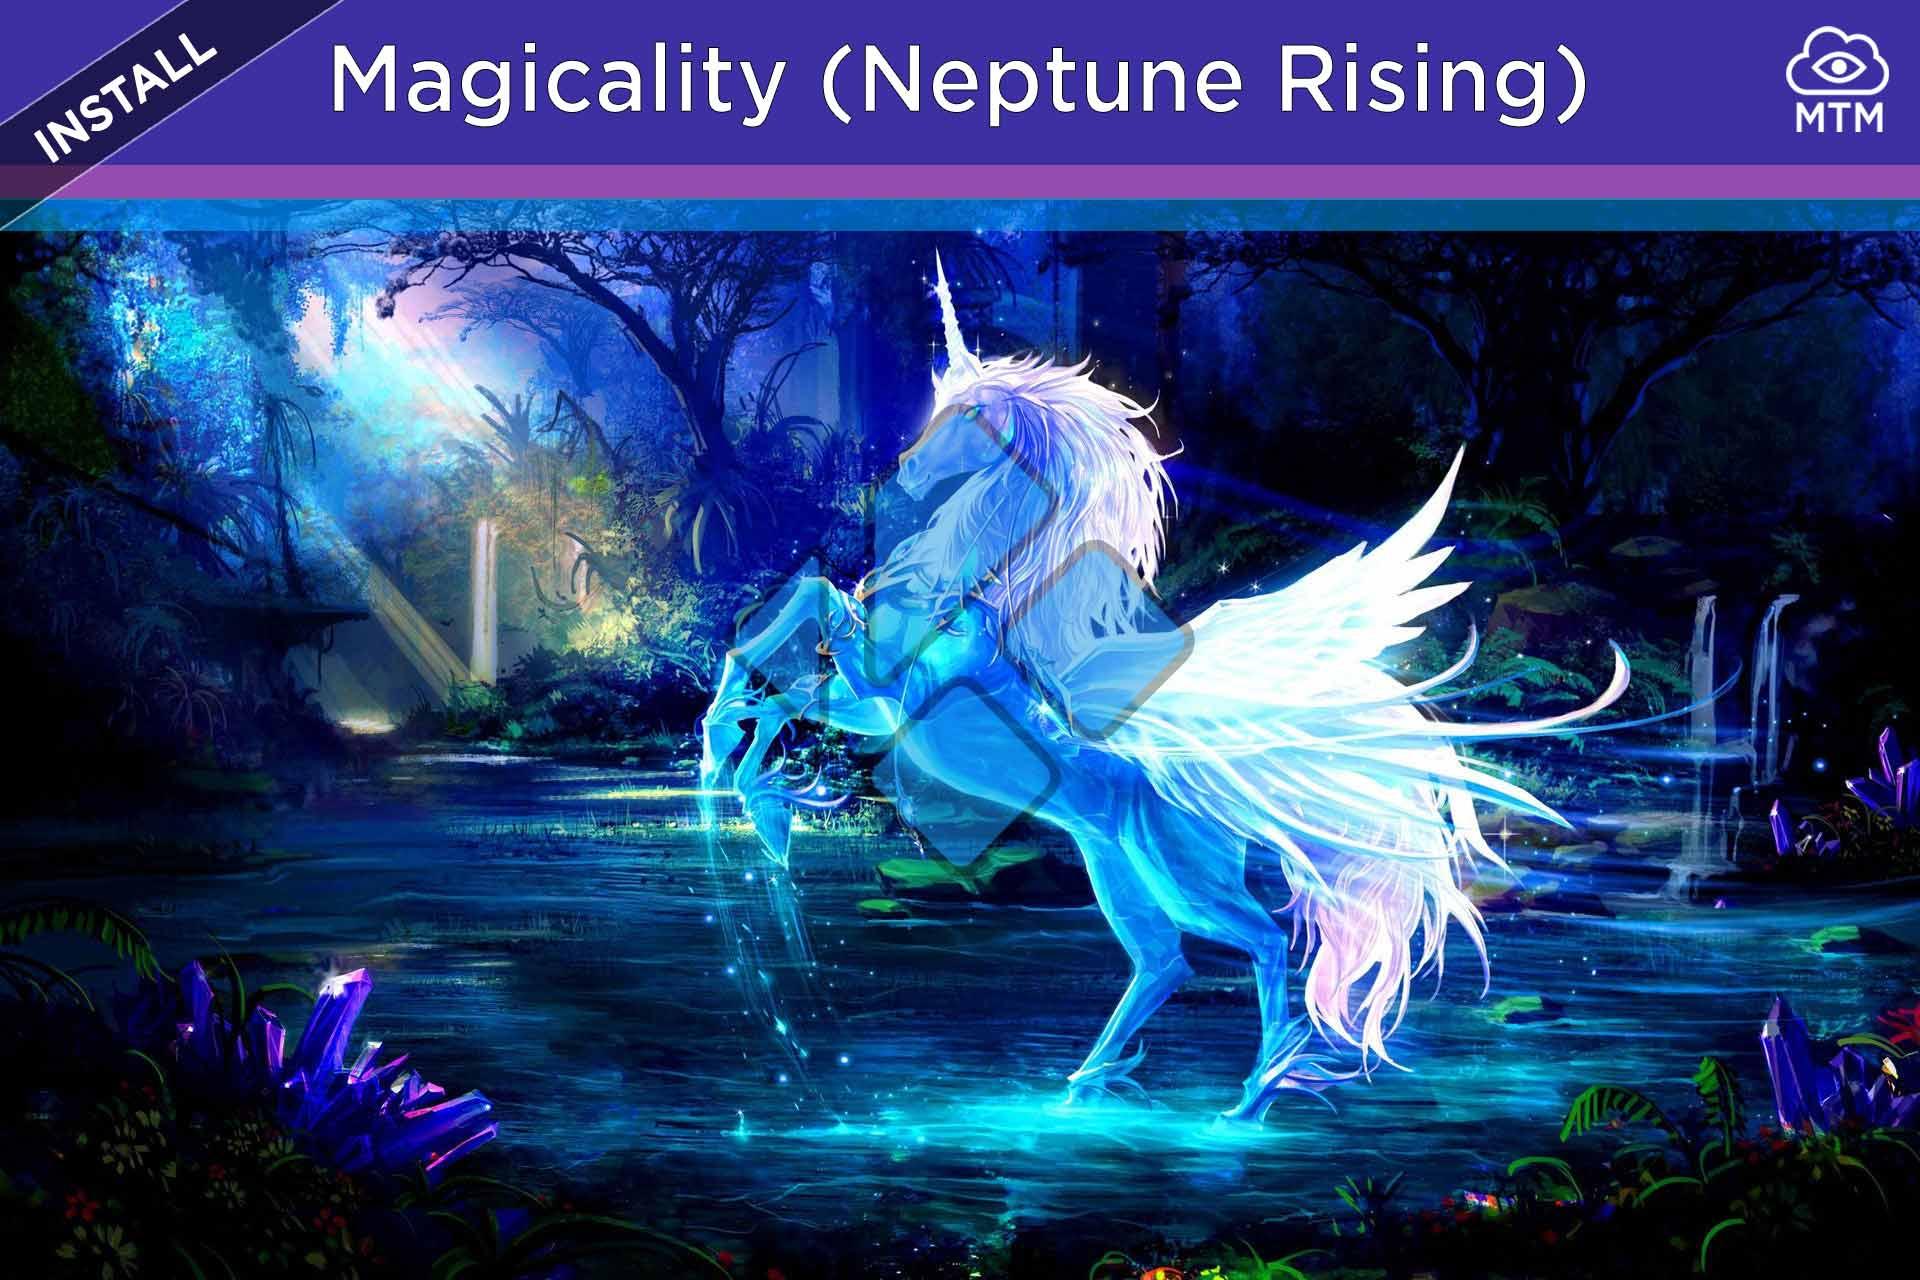 Nola Magicality Kodi Addon Instalatu (Neptuno Rising Alternative)